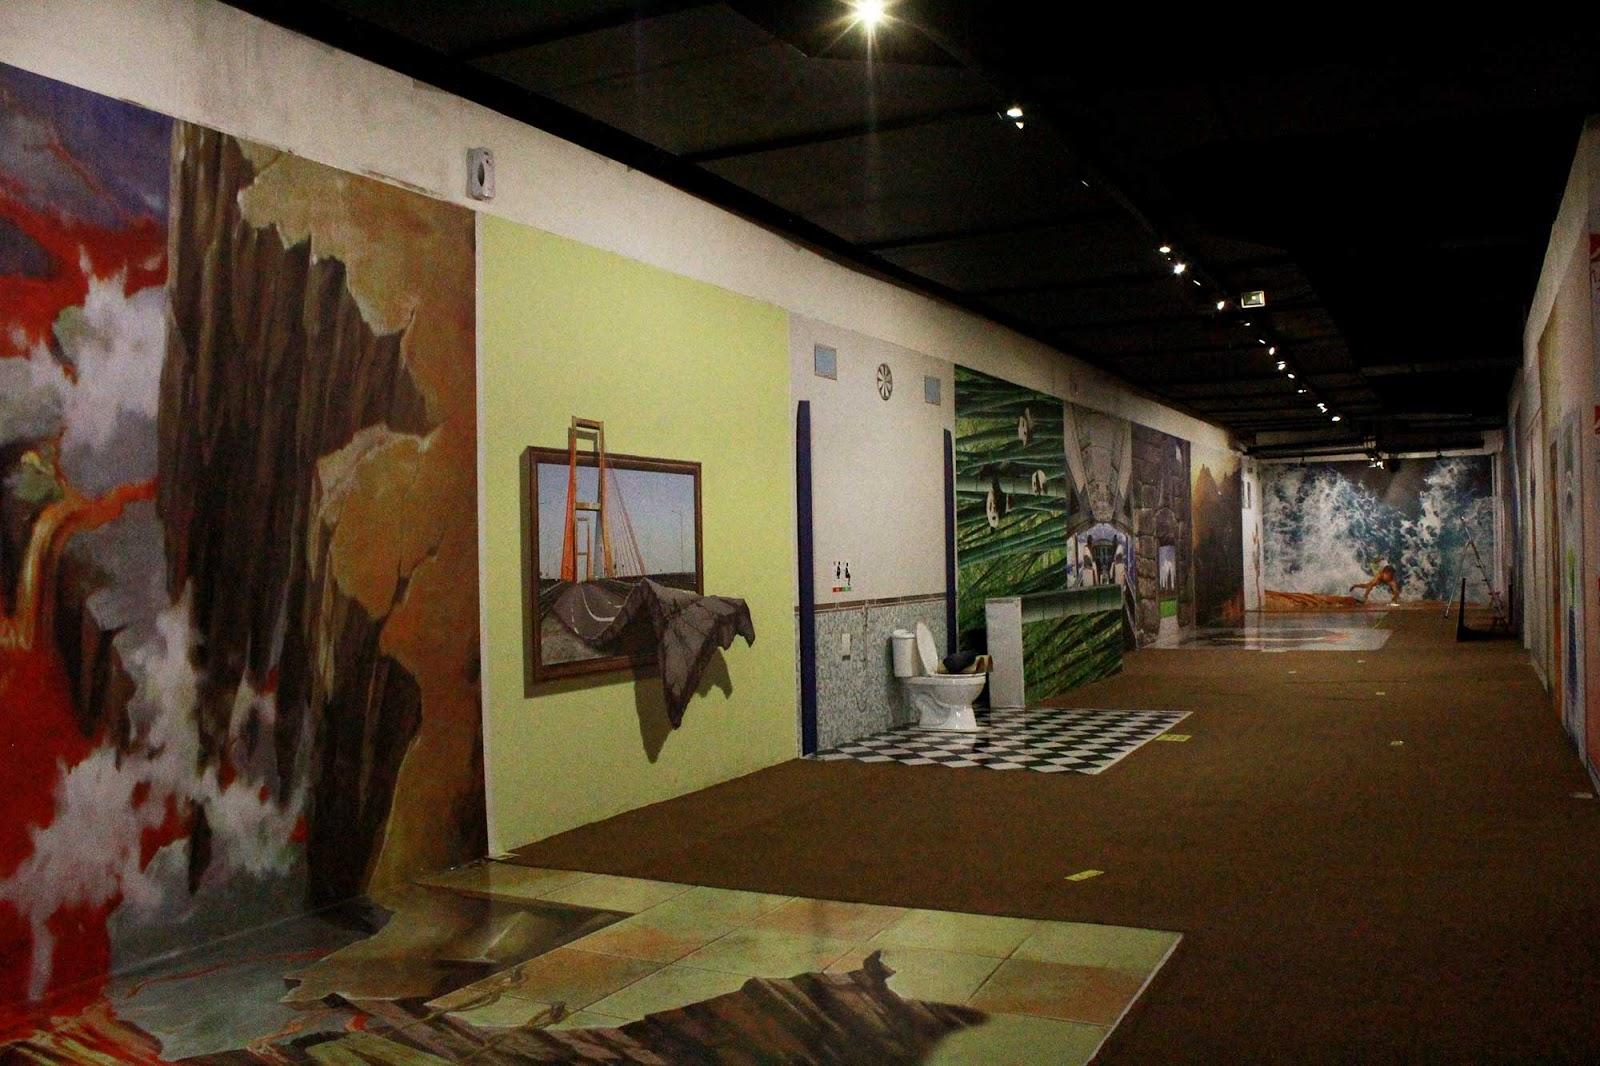 Conecmall Official Blog De Mata Trick Eye Museum Sebelumnya Berlokasi